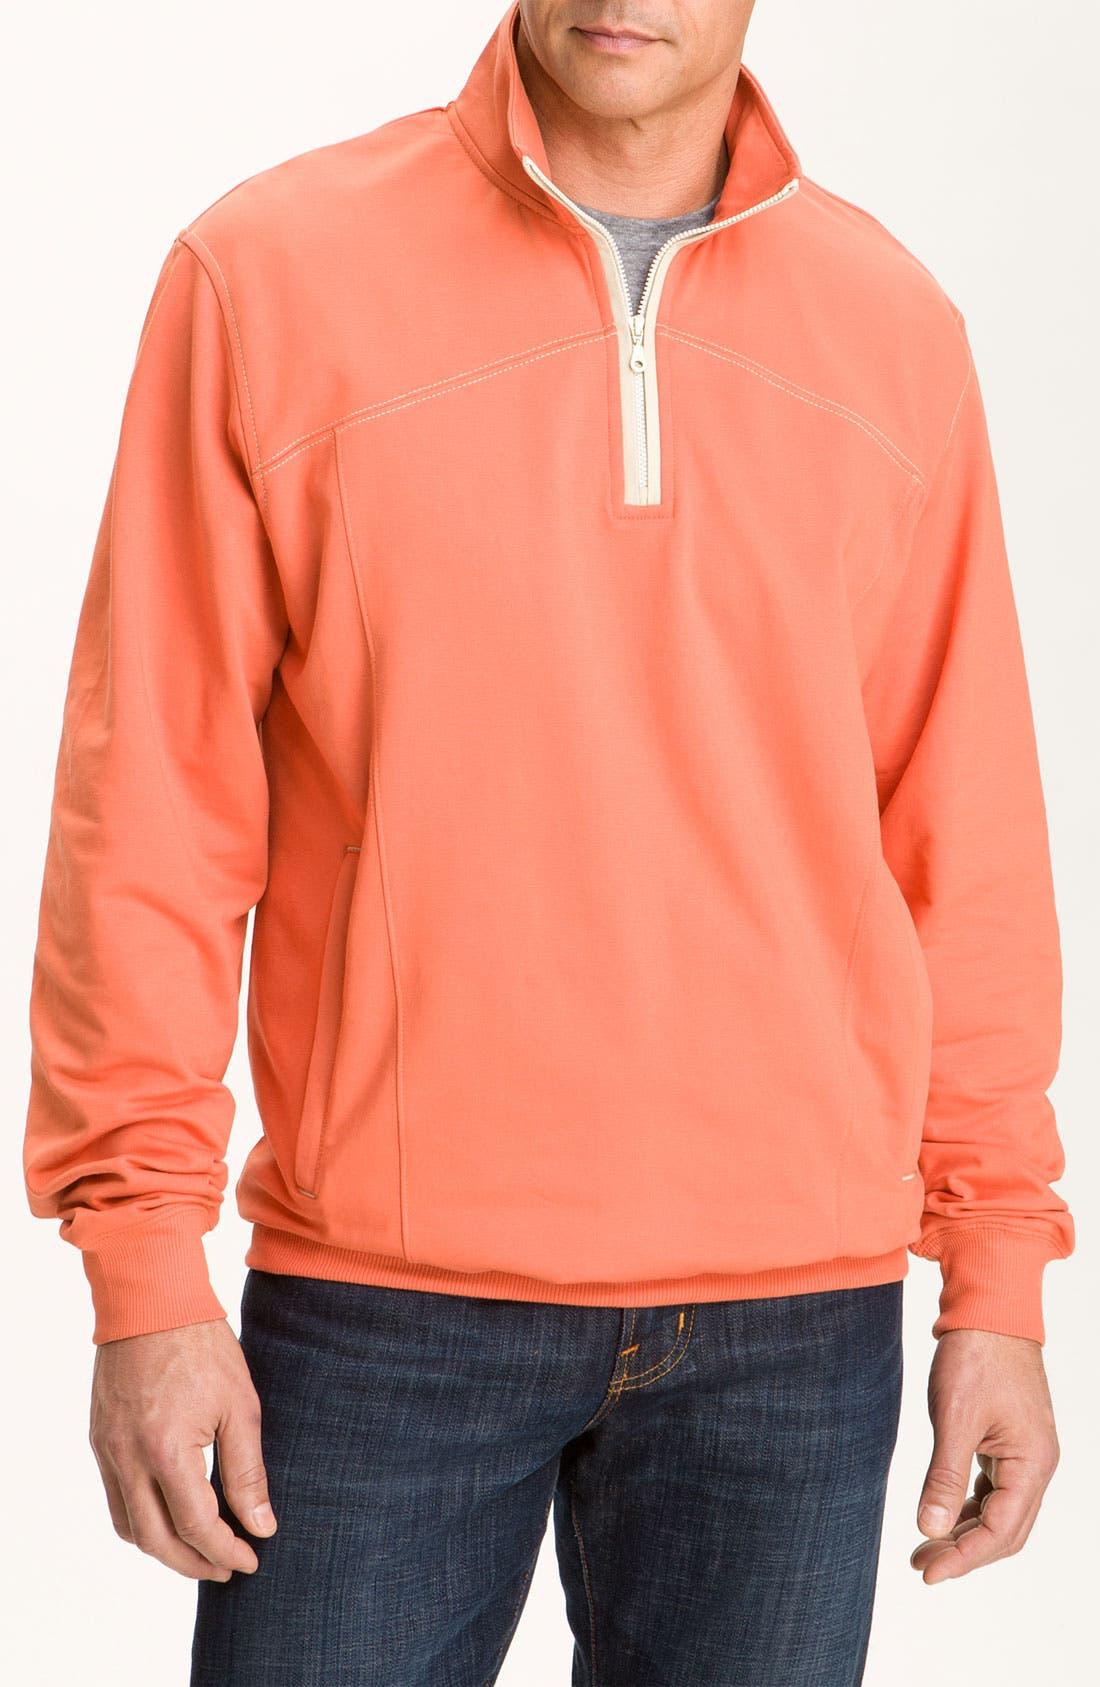 Alternate Image 1 Selected - Cutter & Buck 'Mackenzie' Pullover Sweatshirt